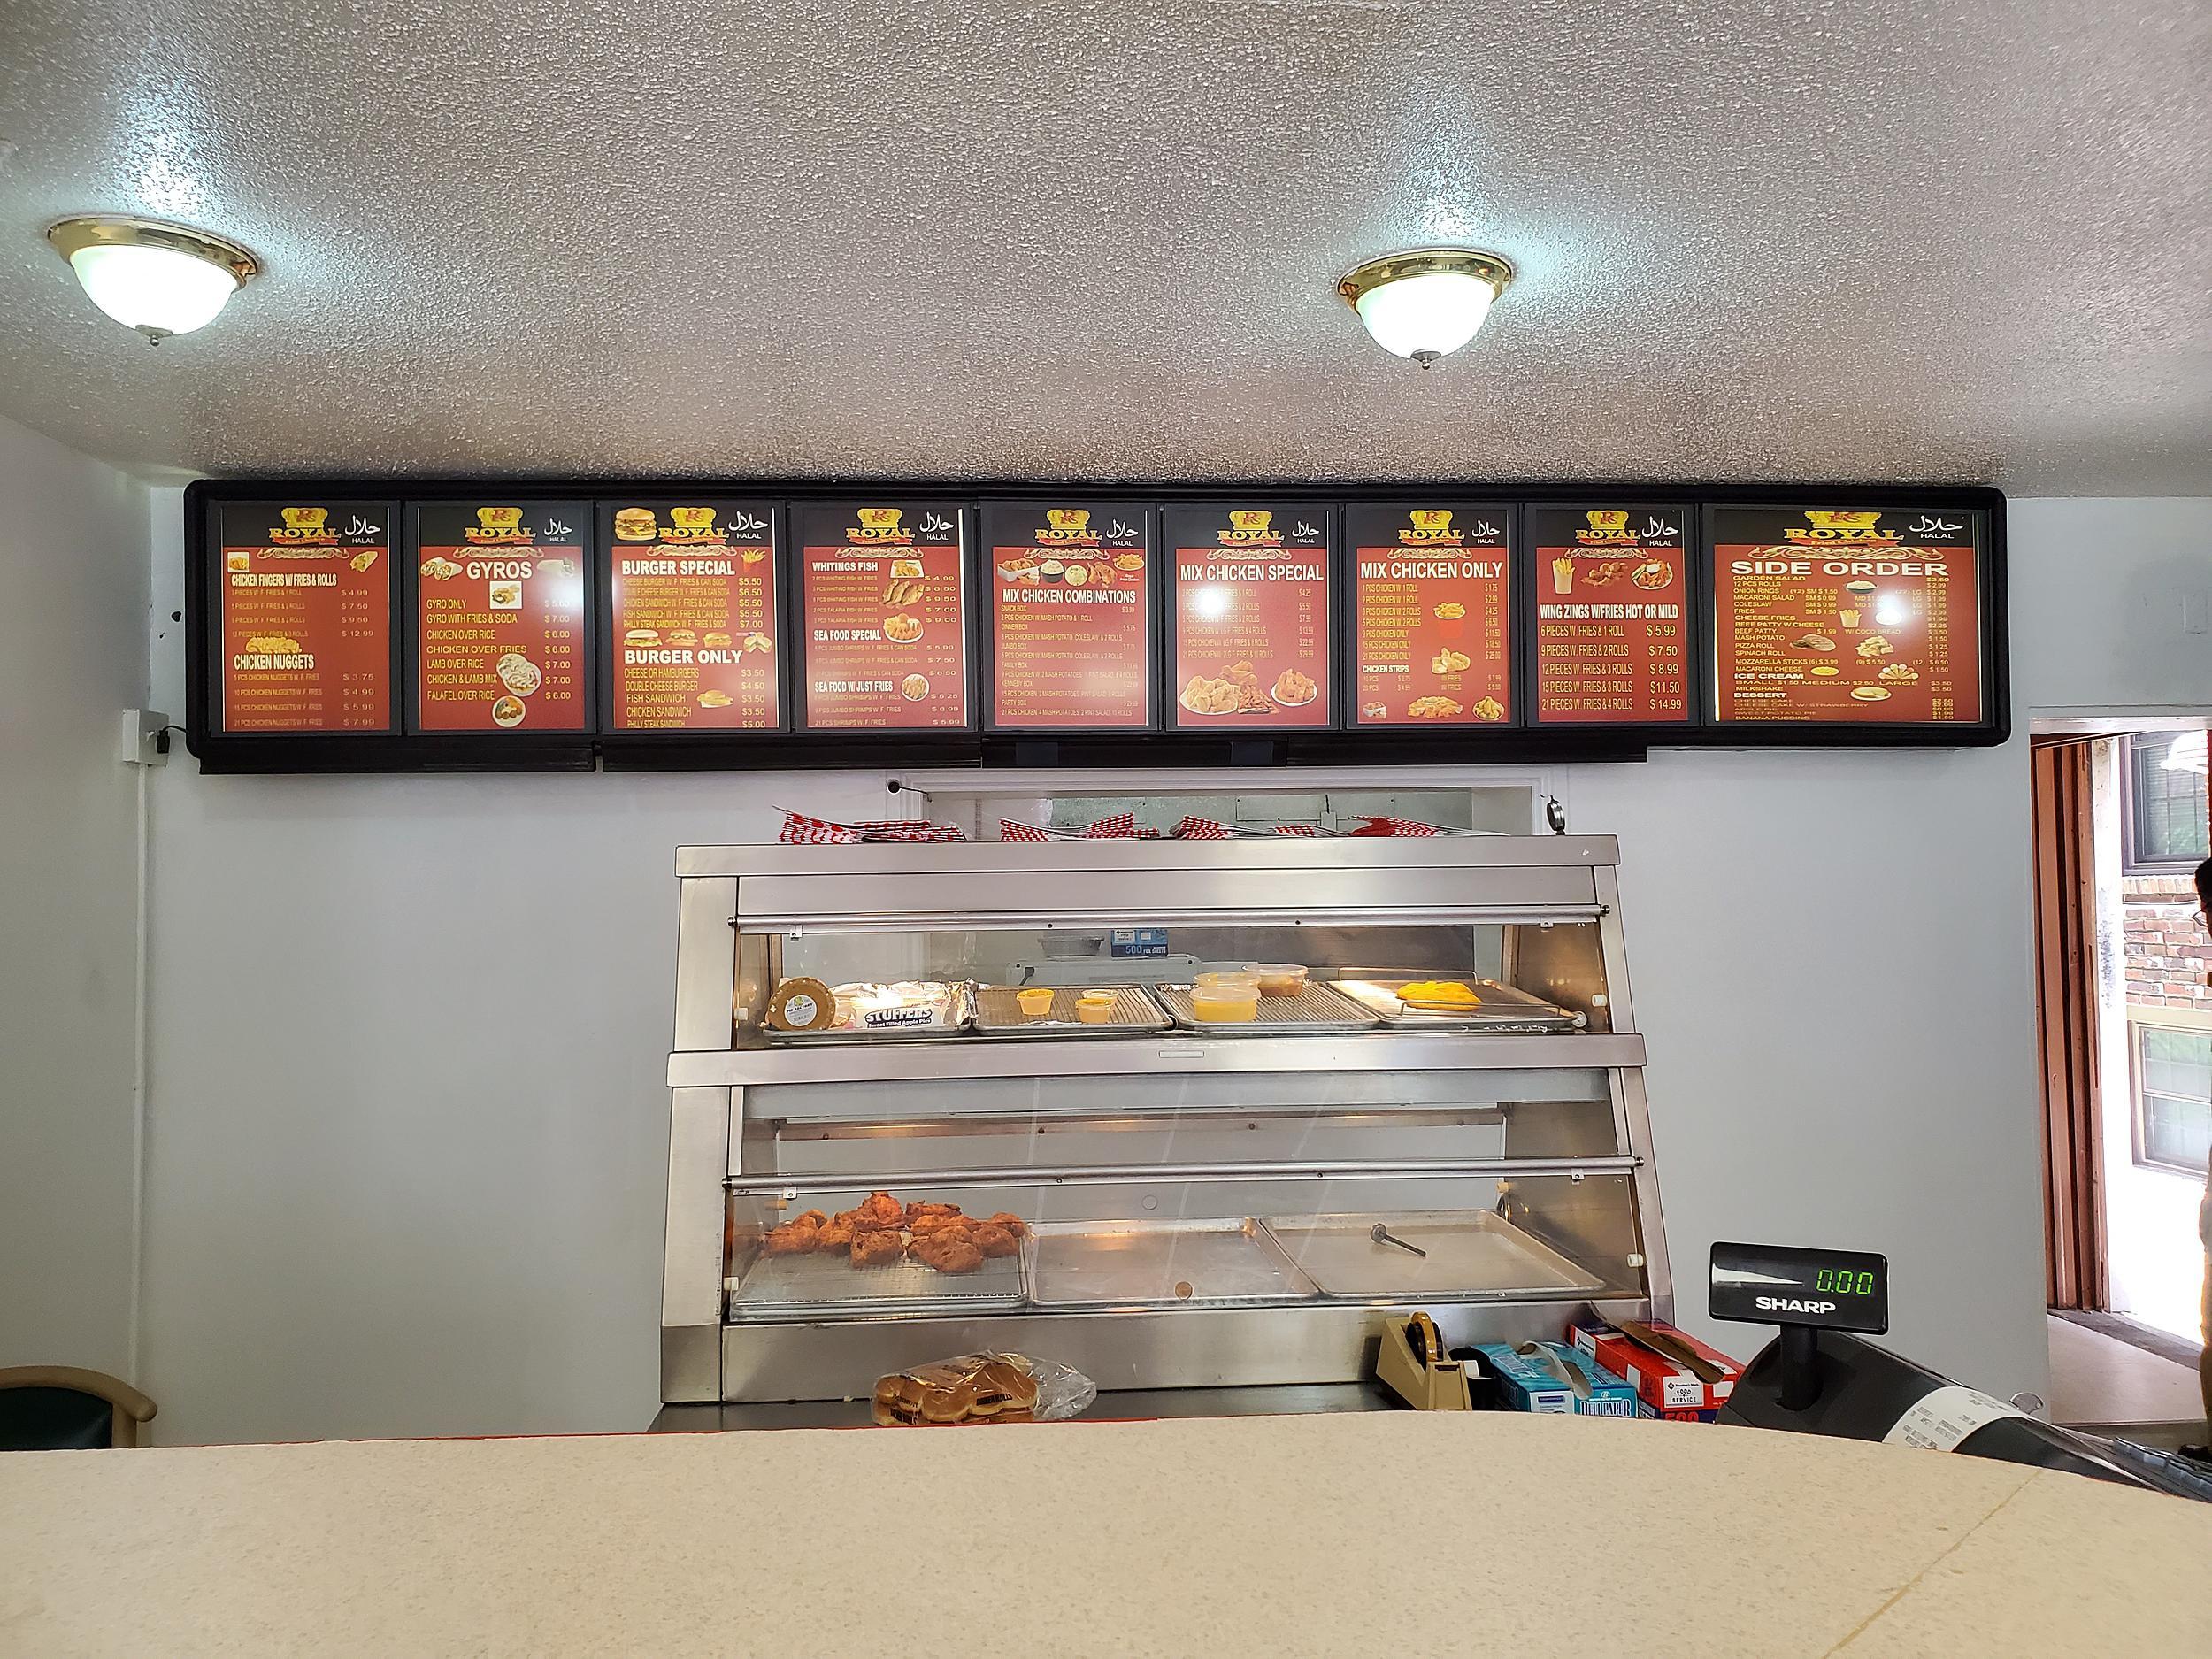 New Restaurant Opens At Binghamton Grotta Azzurra Site